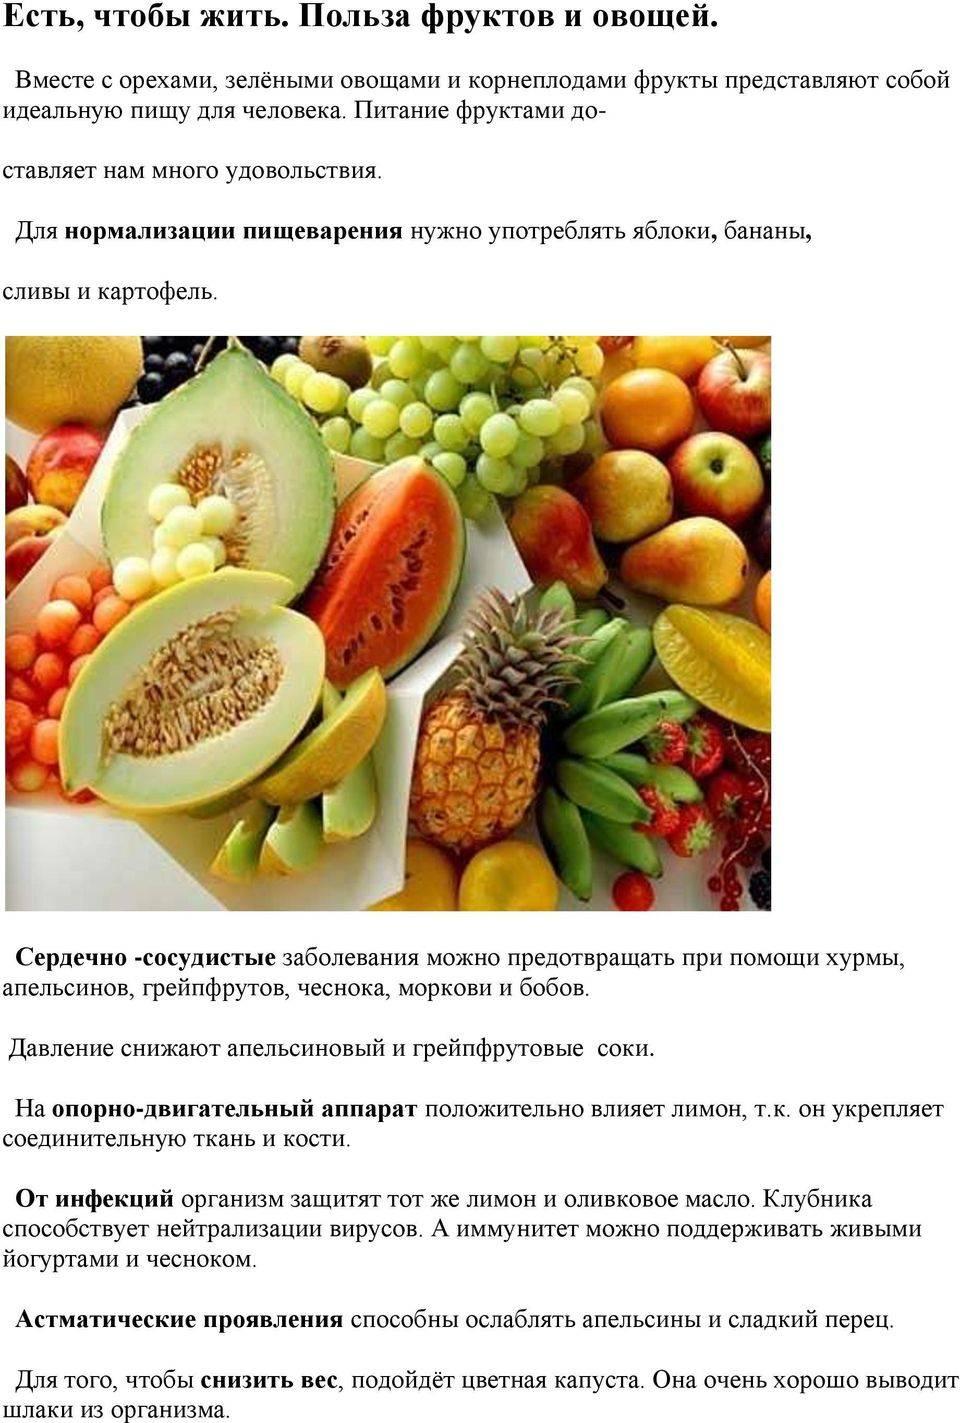 Рацион фруктов и ягод при диабете